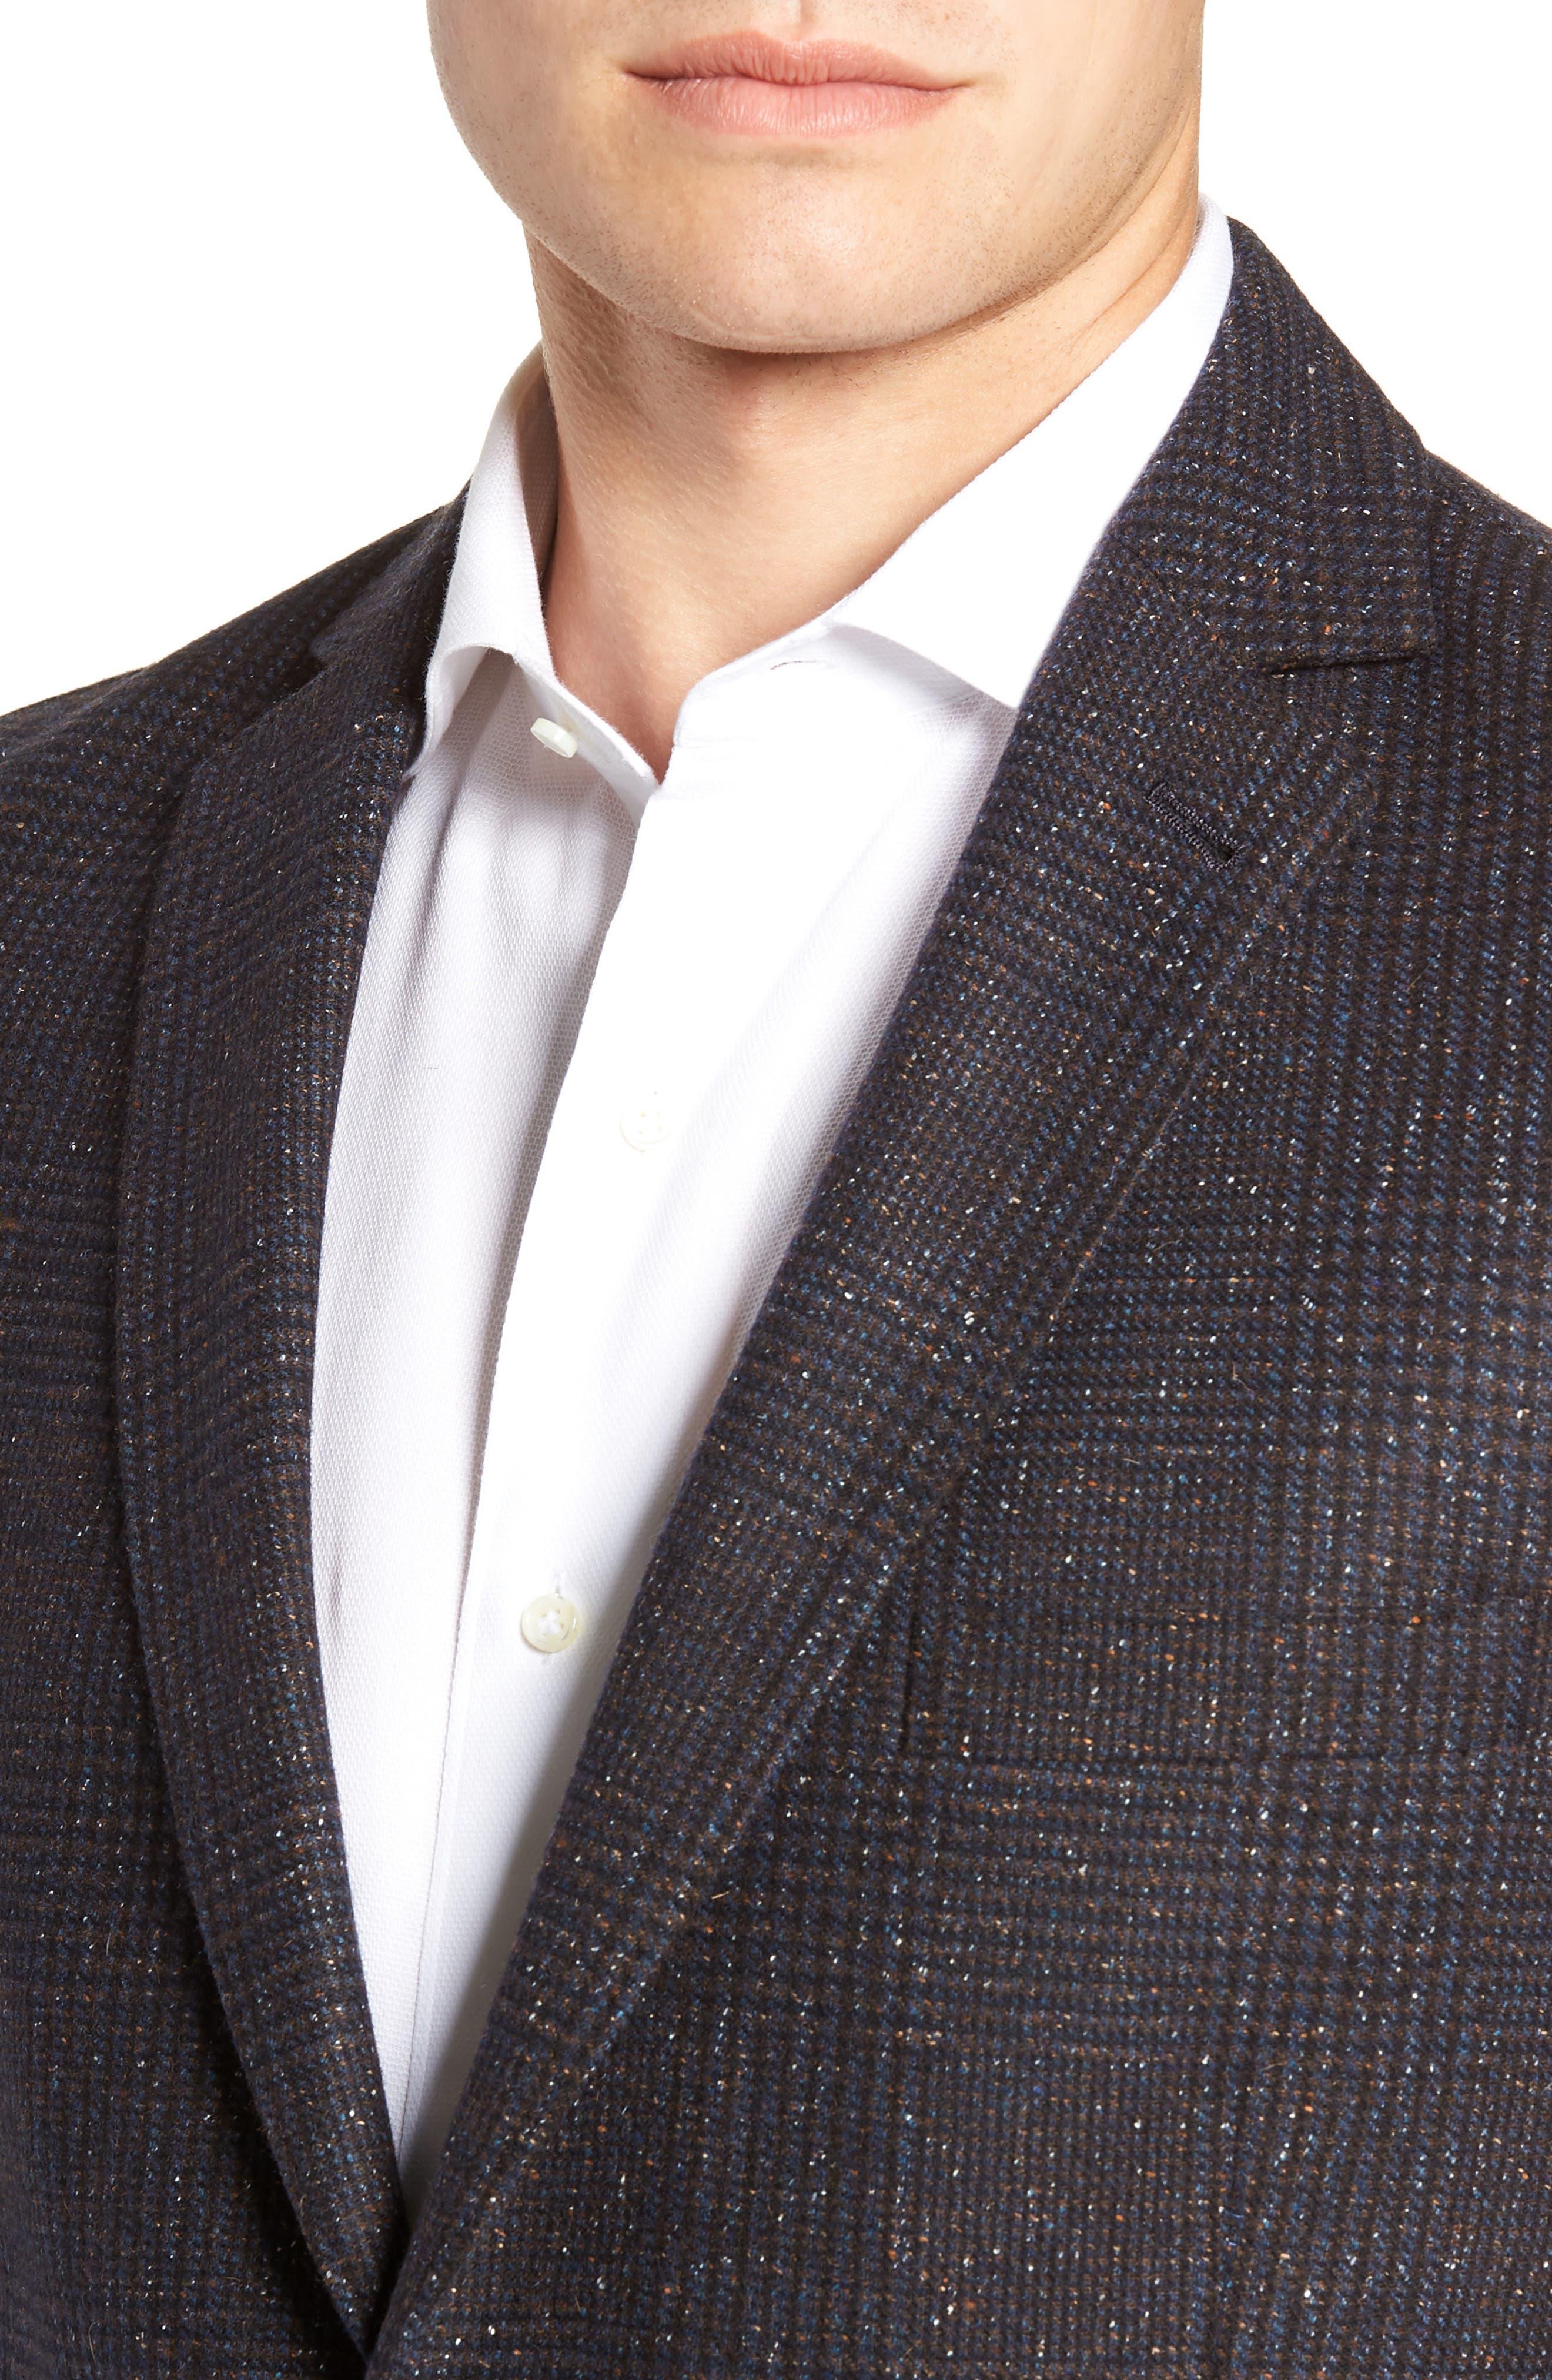 Regular Fit Wool & Silk Blend Blazer,                             Alternate thumbnail 4, color,                             BROWN